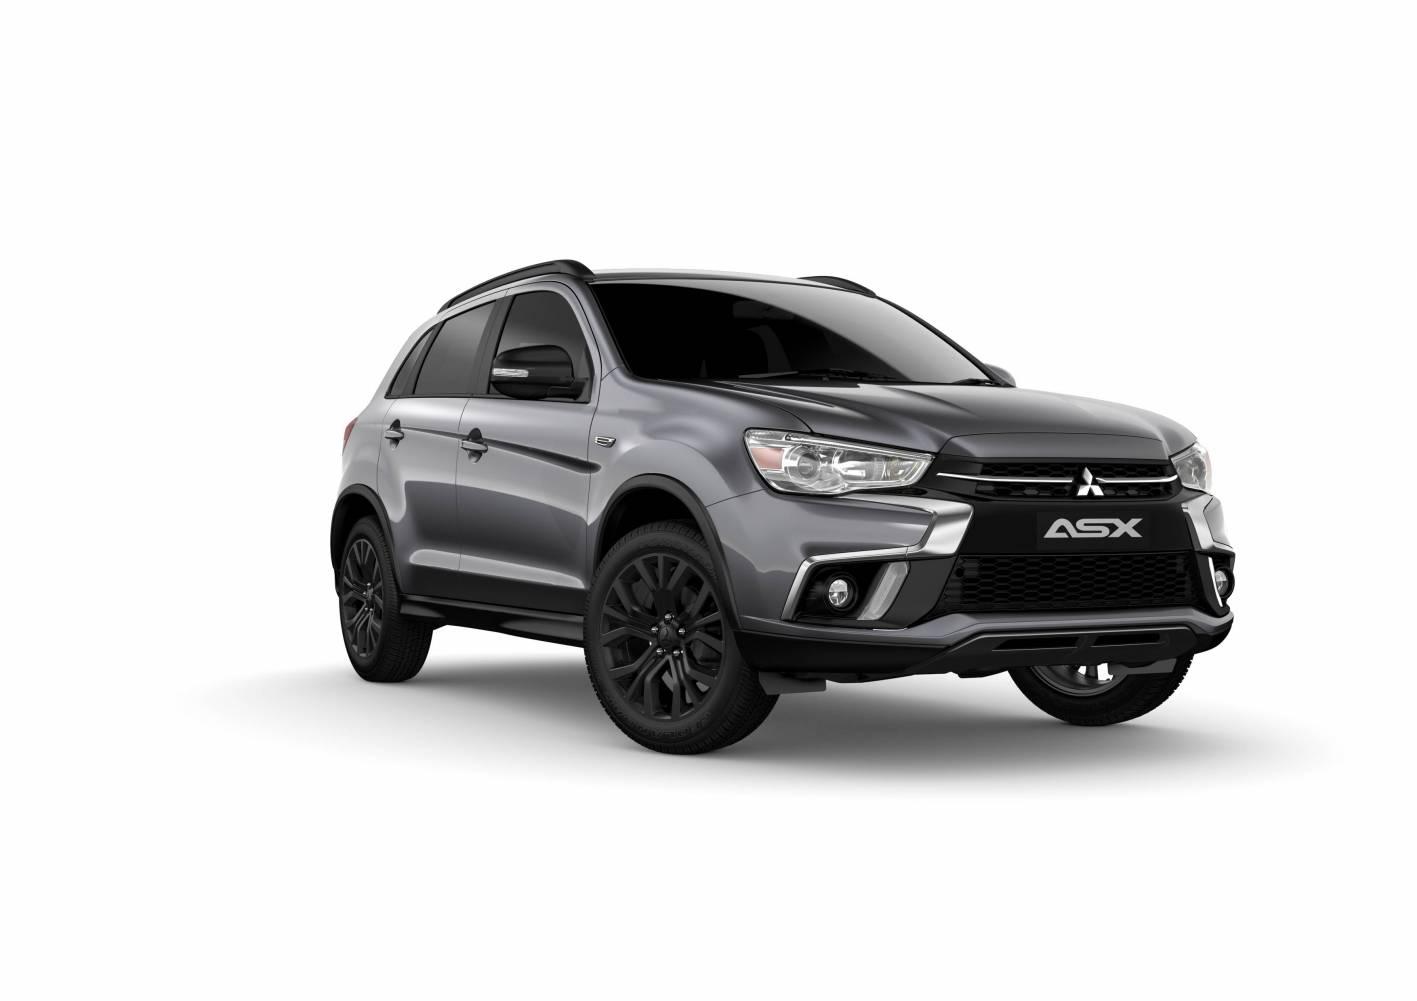 Mitsubishi ASX Black Edition goes on sale